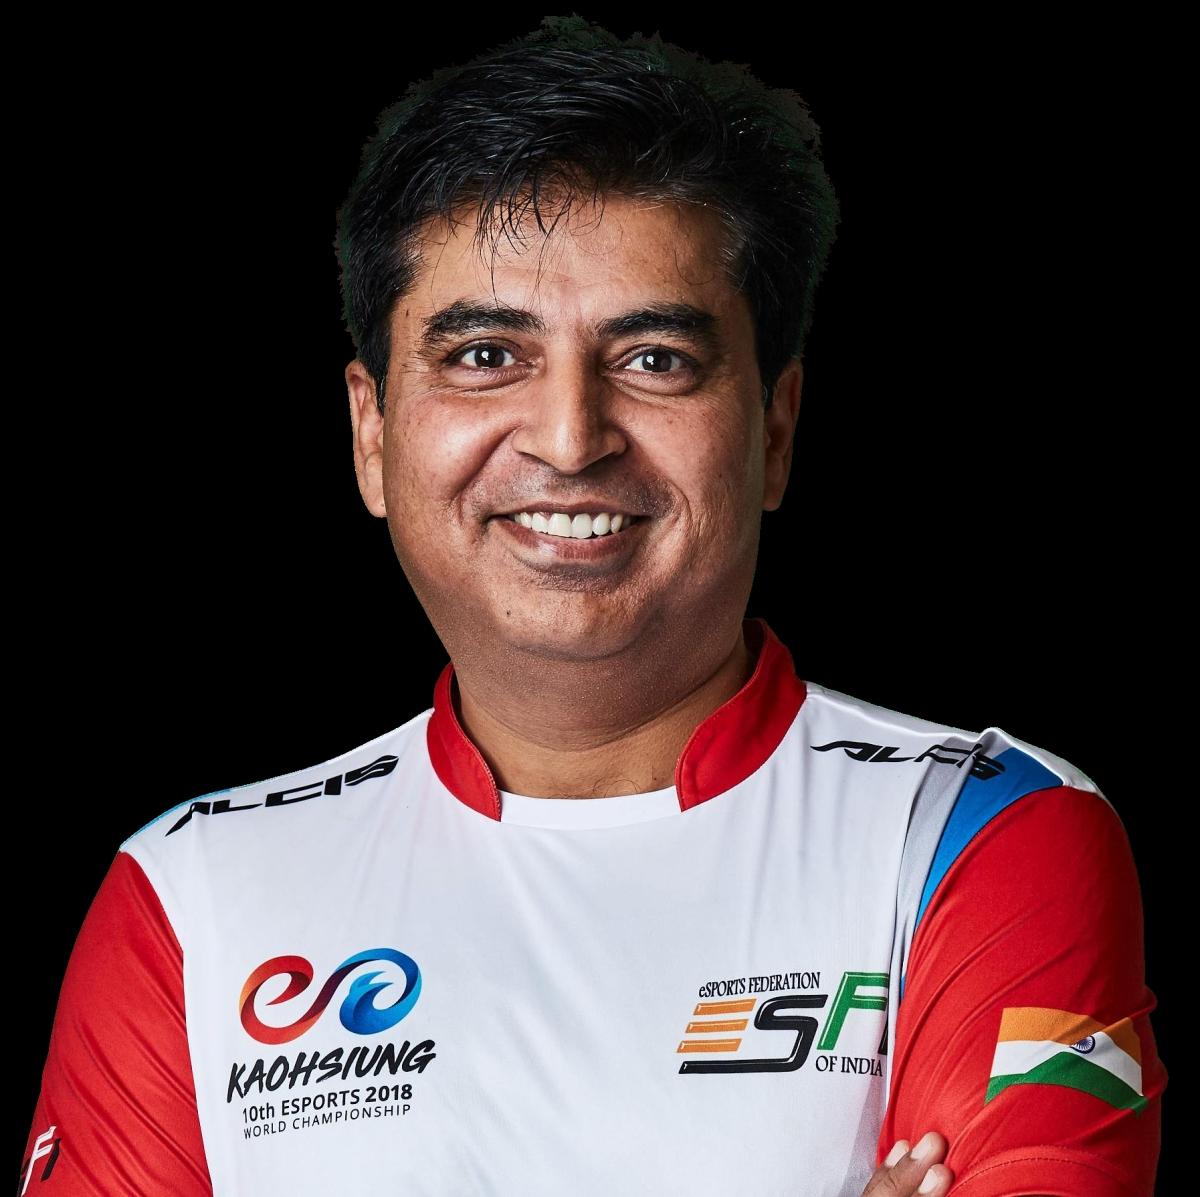 Mr. Lokesh Suji, Director of Esports Federation of India